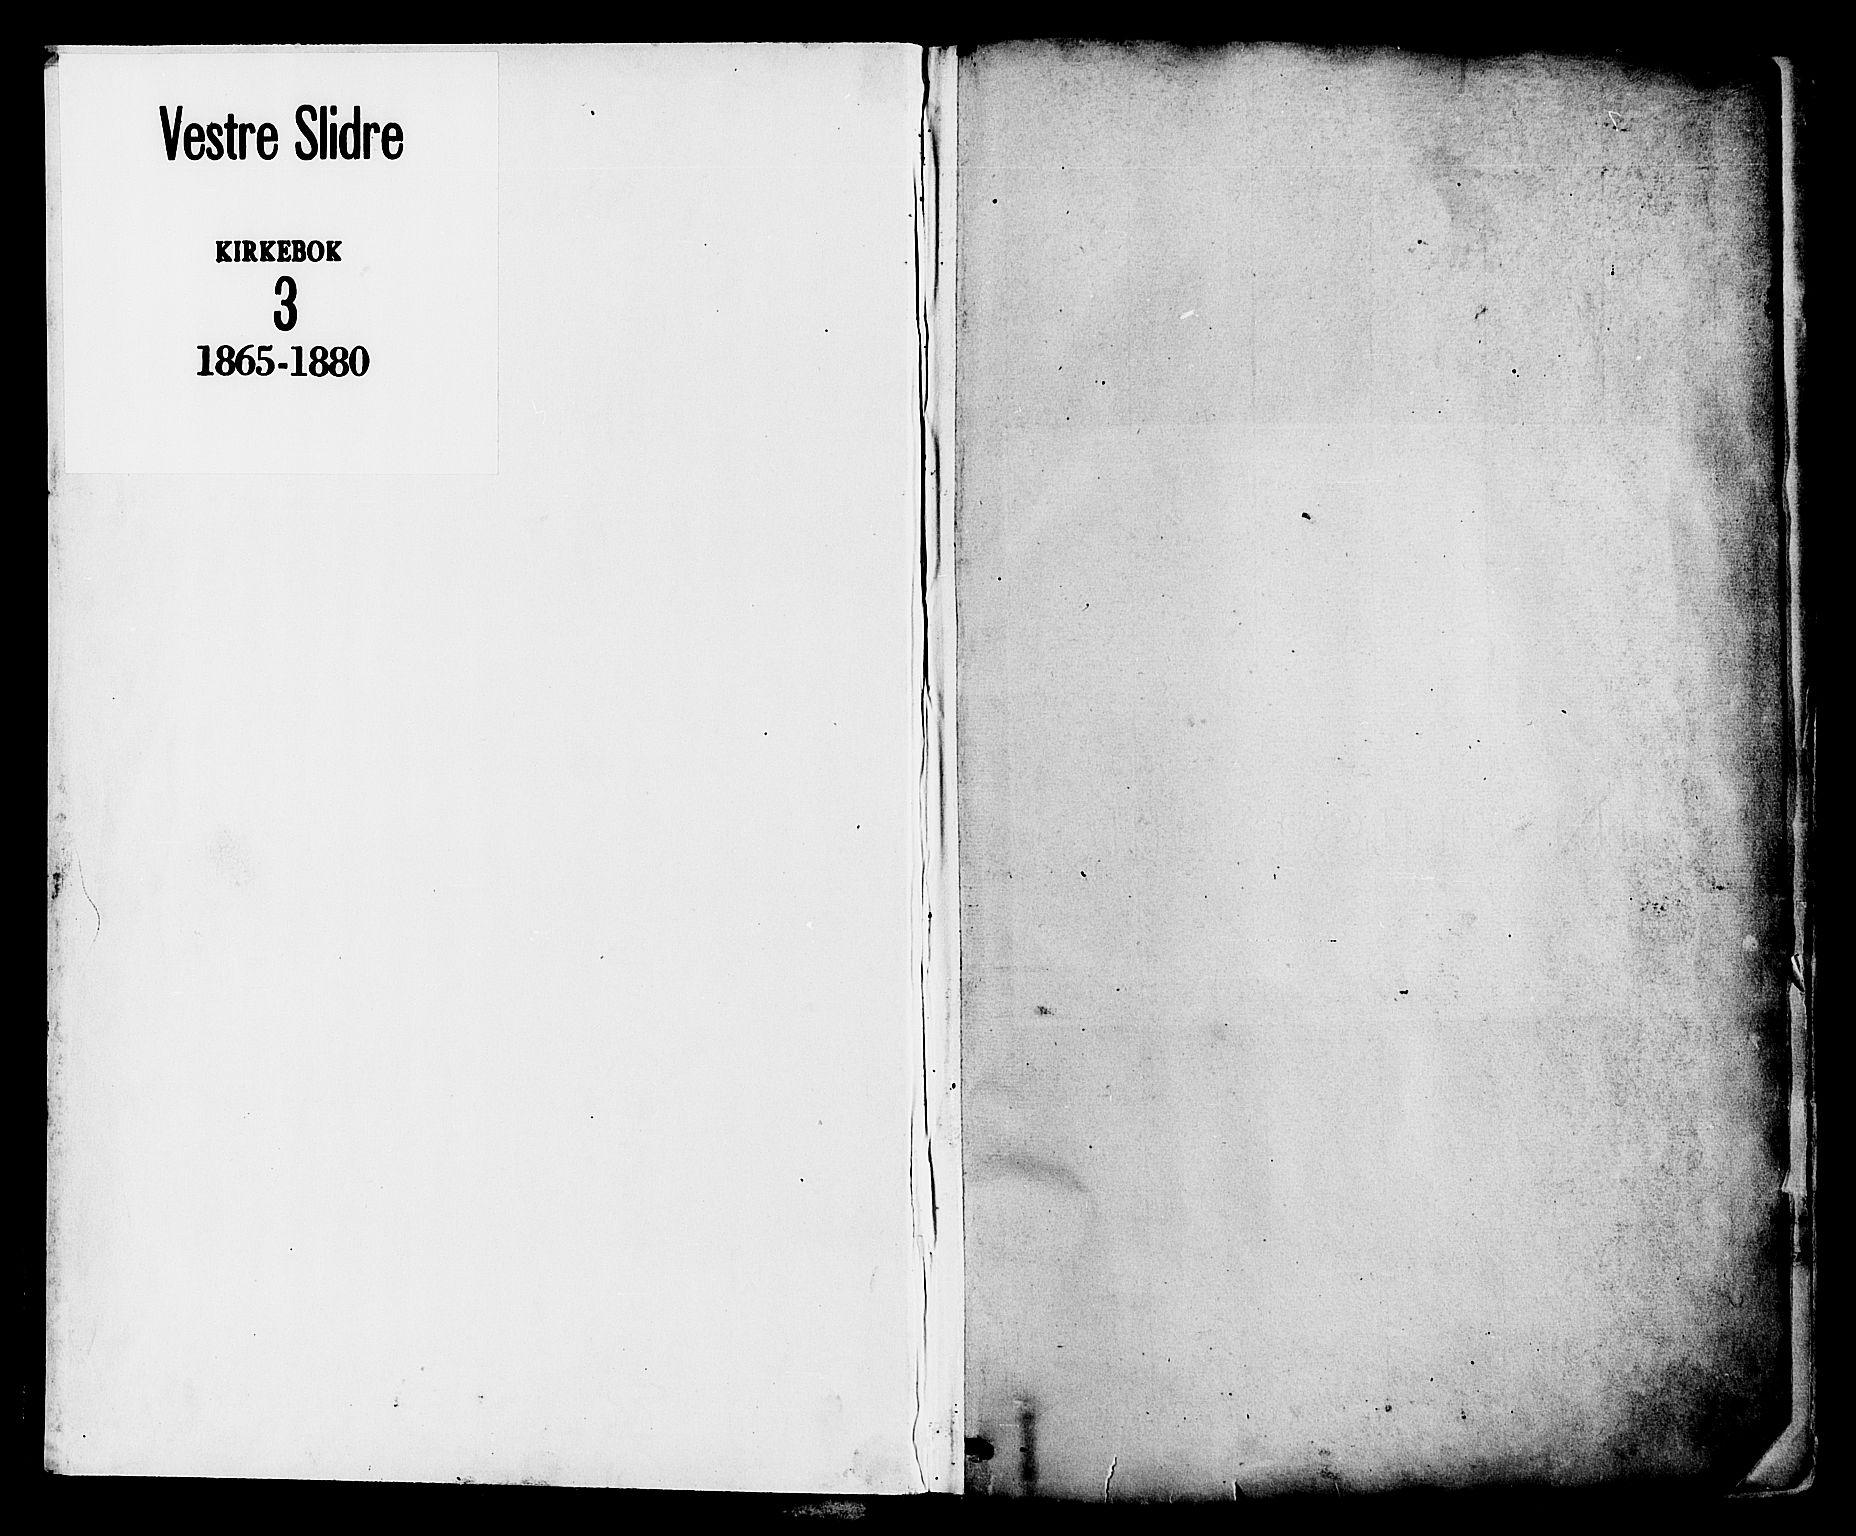 SAH, Vestre Slidre prestekontor, Ministerialbok nr. 3, 1865-1880, s. 1